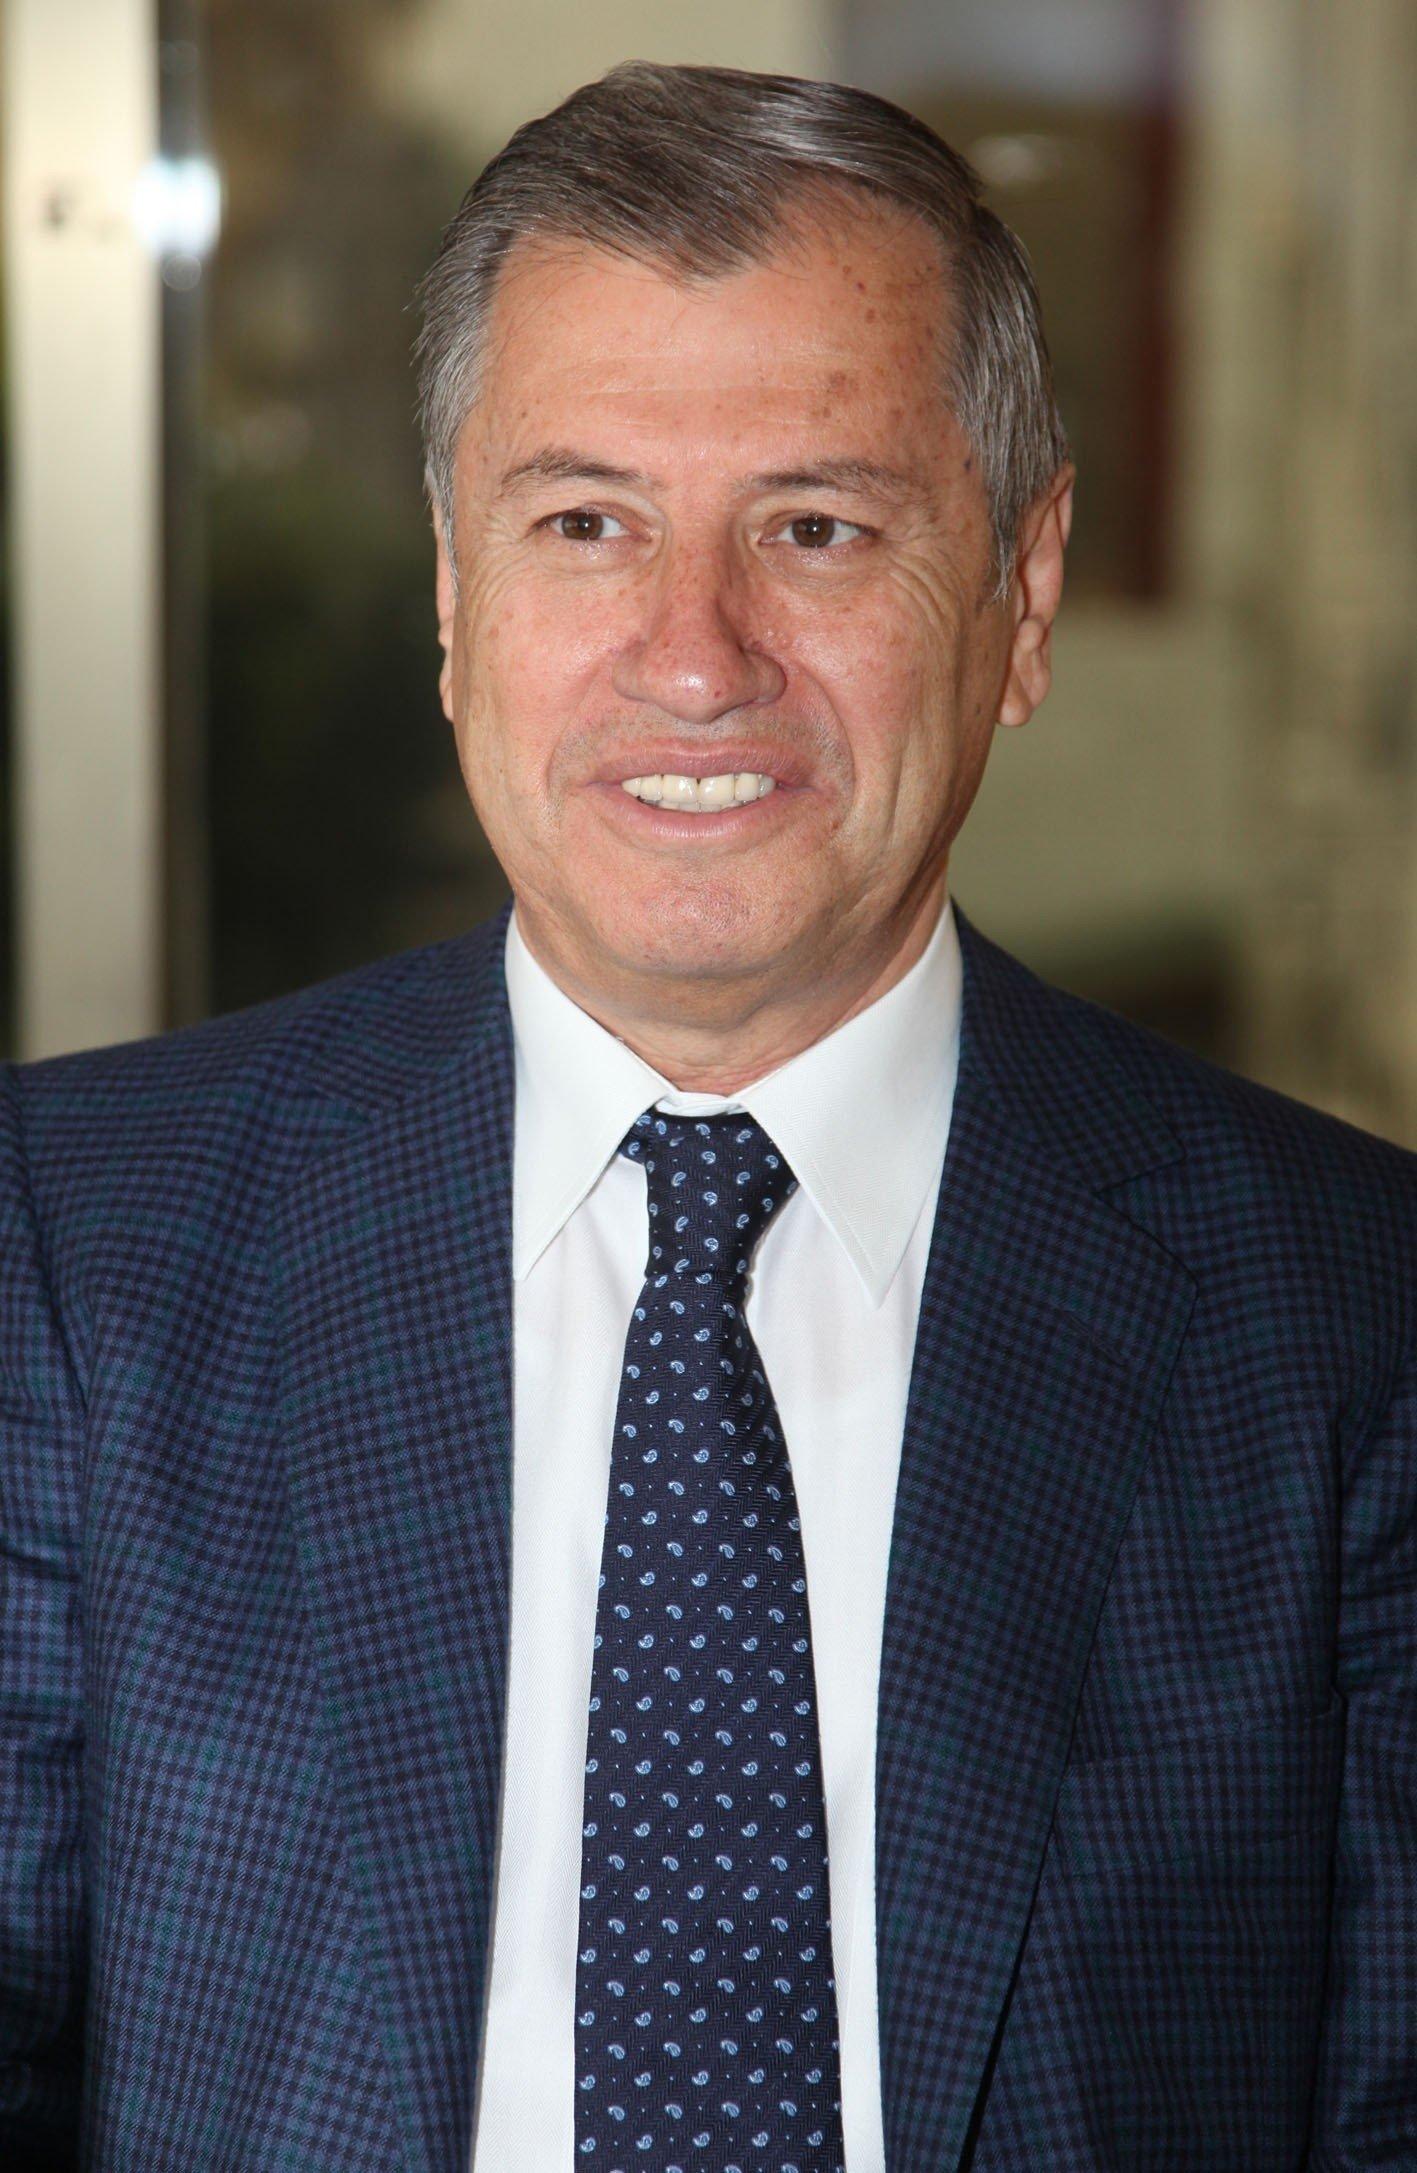 Atila Menevse, chairperson of the Adana Chamber of Commerce, in Adana, southern Turkey, Jan. 25, 2021. (IHA Photo)